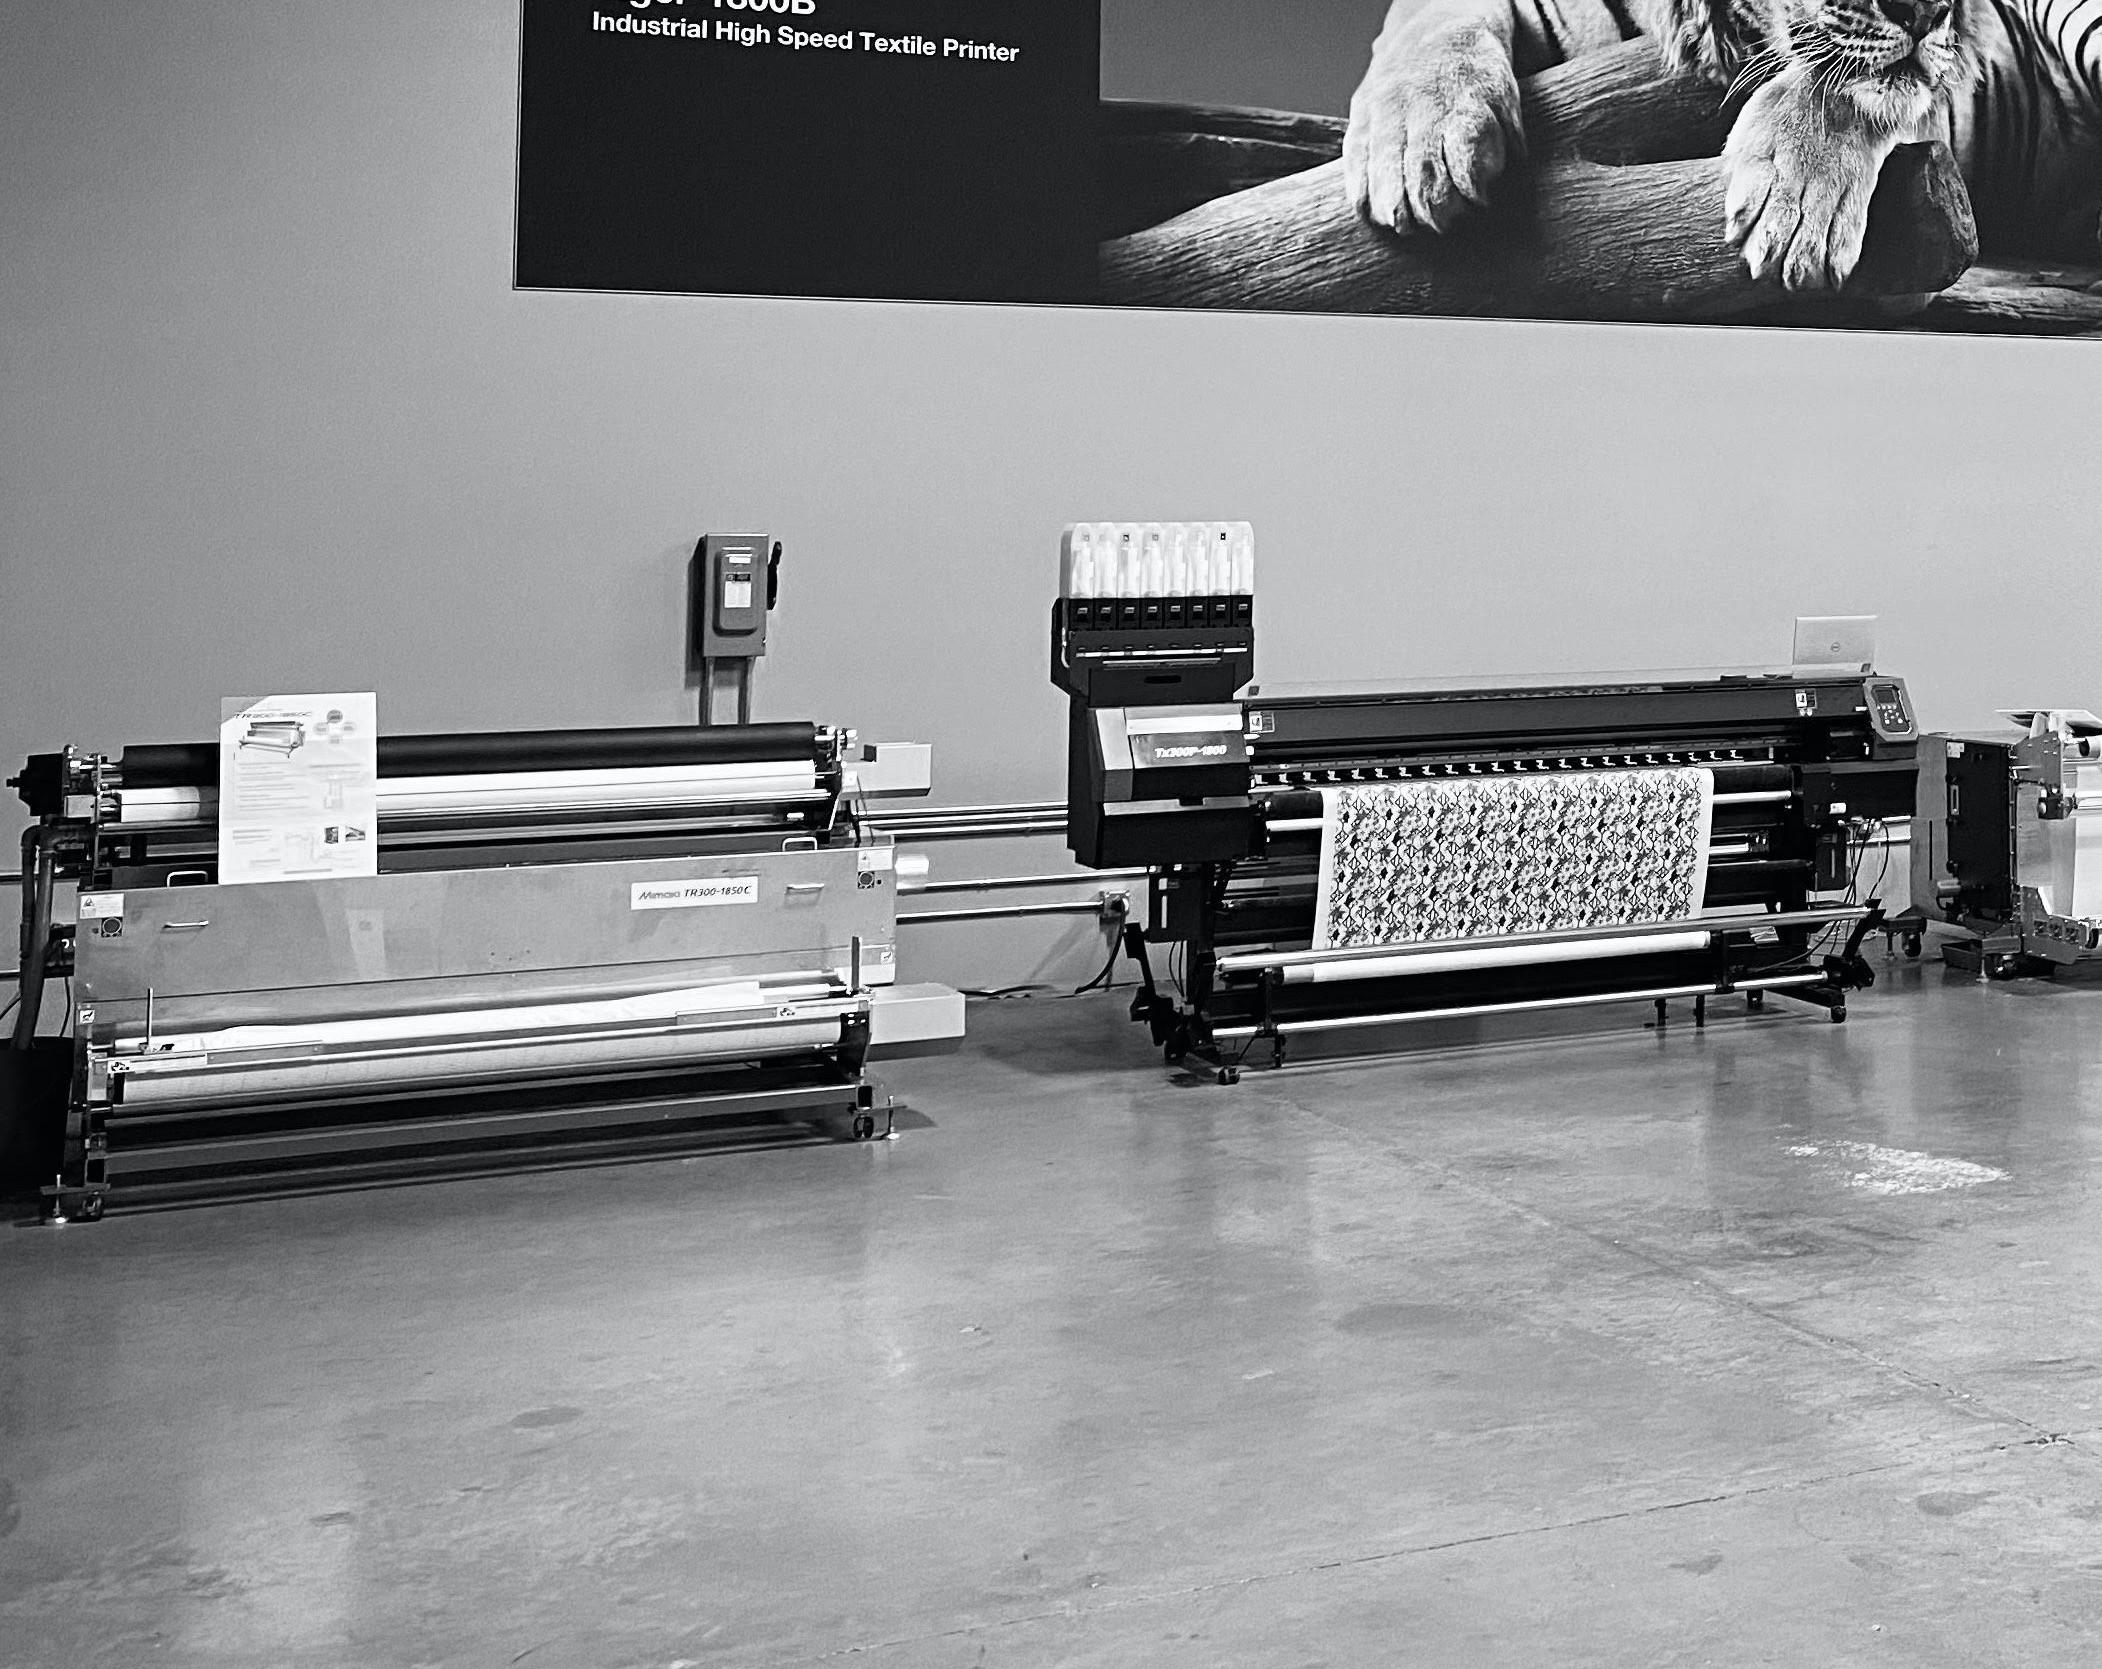 Mimaki Digital Textile Printing Workshop